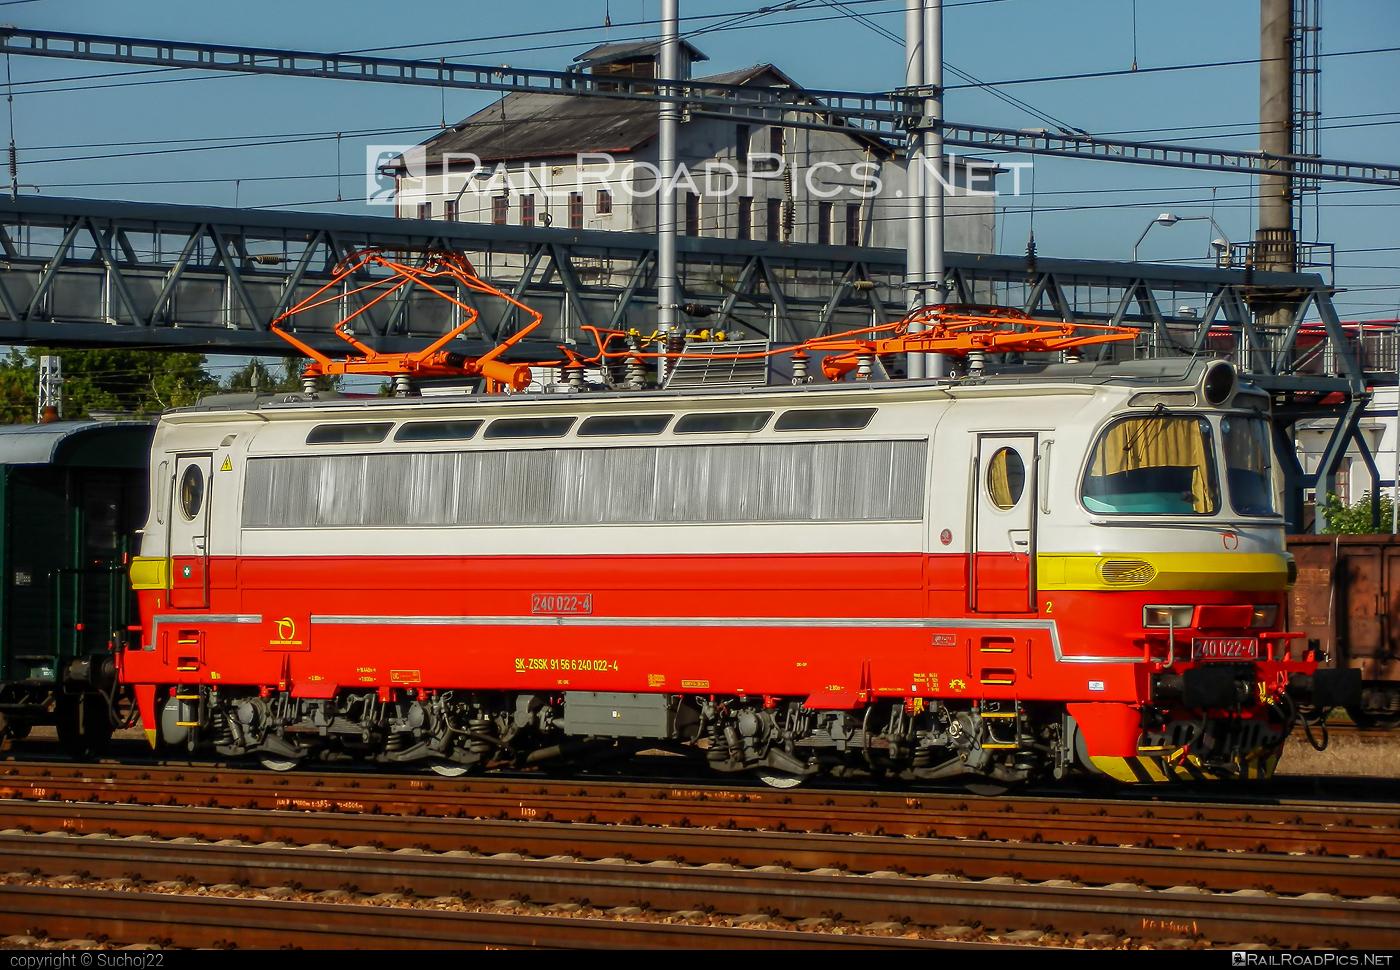 Škoda 47E - 240 022-4 operated by Železničná Spoločnost' Slovensko, a.s. #ZeleznicnaSpolocnostSlovensko #laminatka #locomotive240 #skoda #skoda47e #zssk